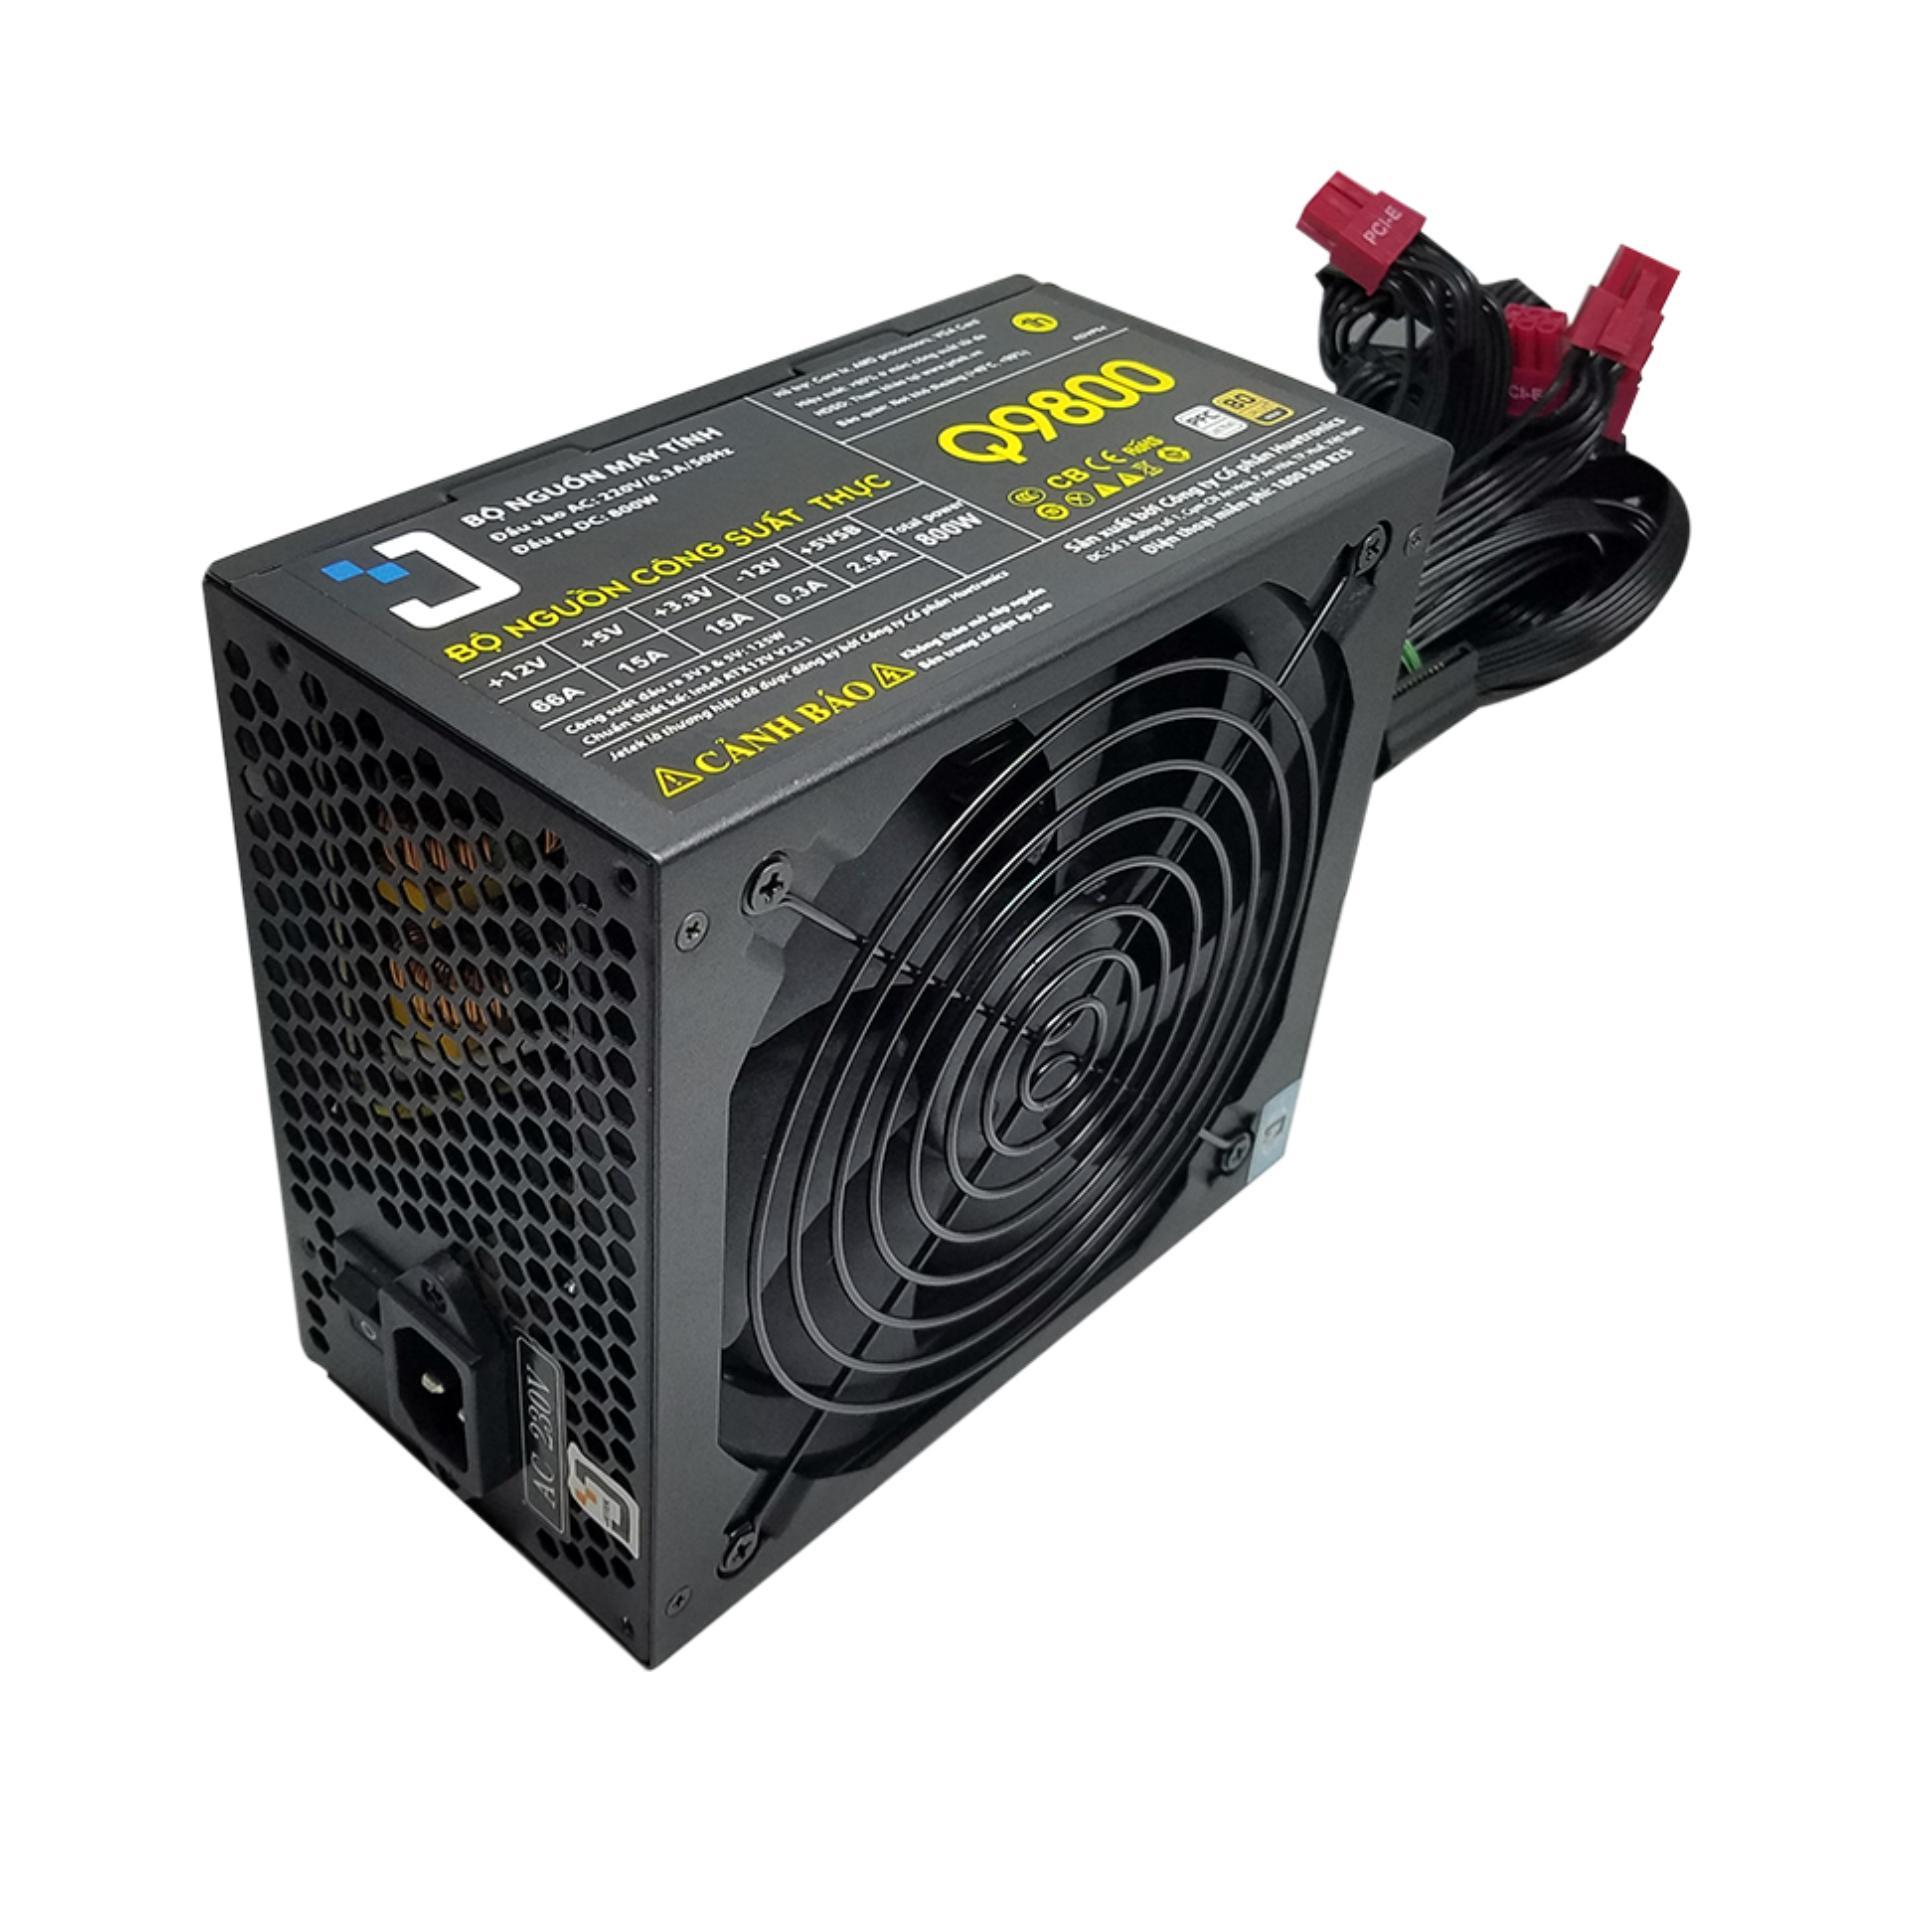 Nguồn Jetek Q9800 Gaming Bitcoin 80 Plus Gold Jetek Chiết Khấu 50